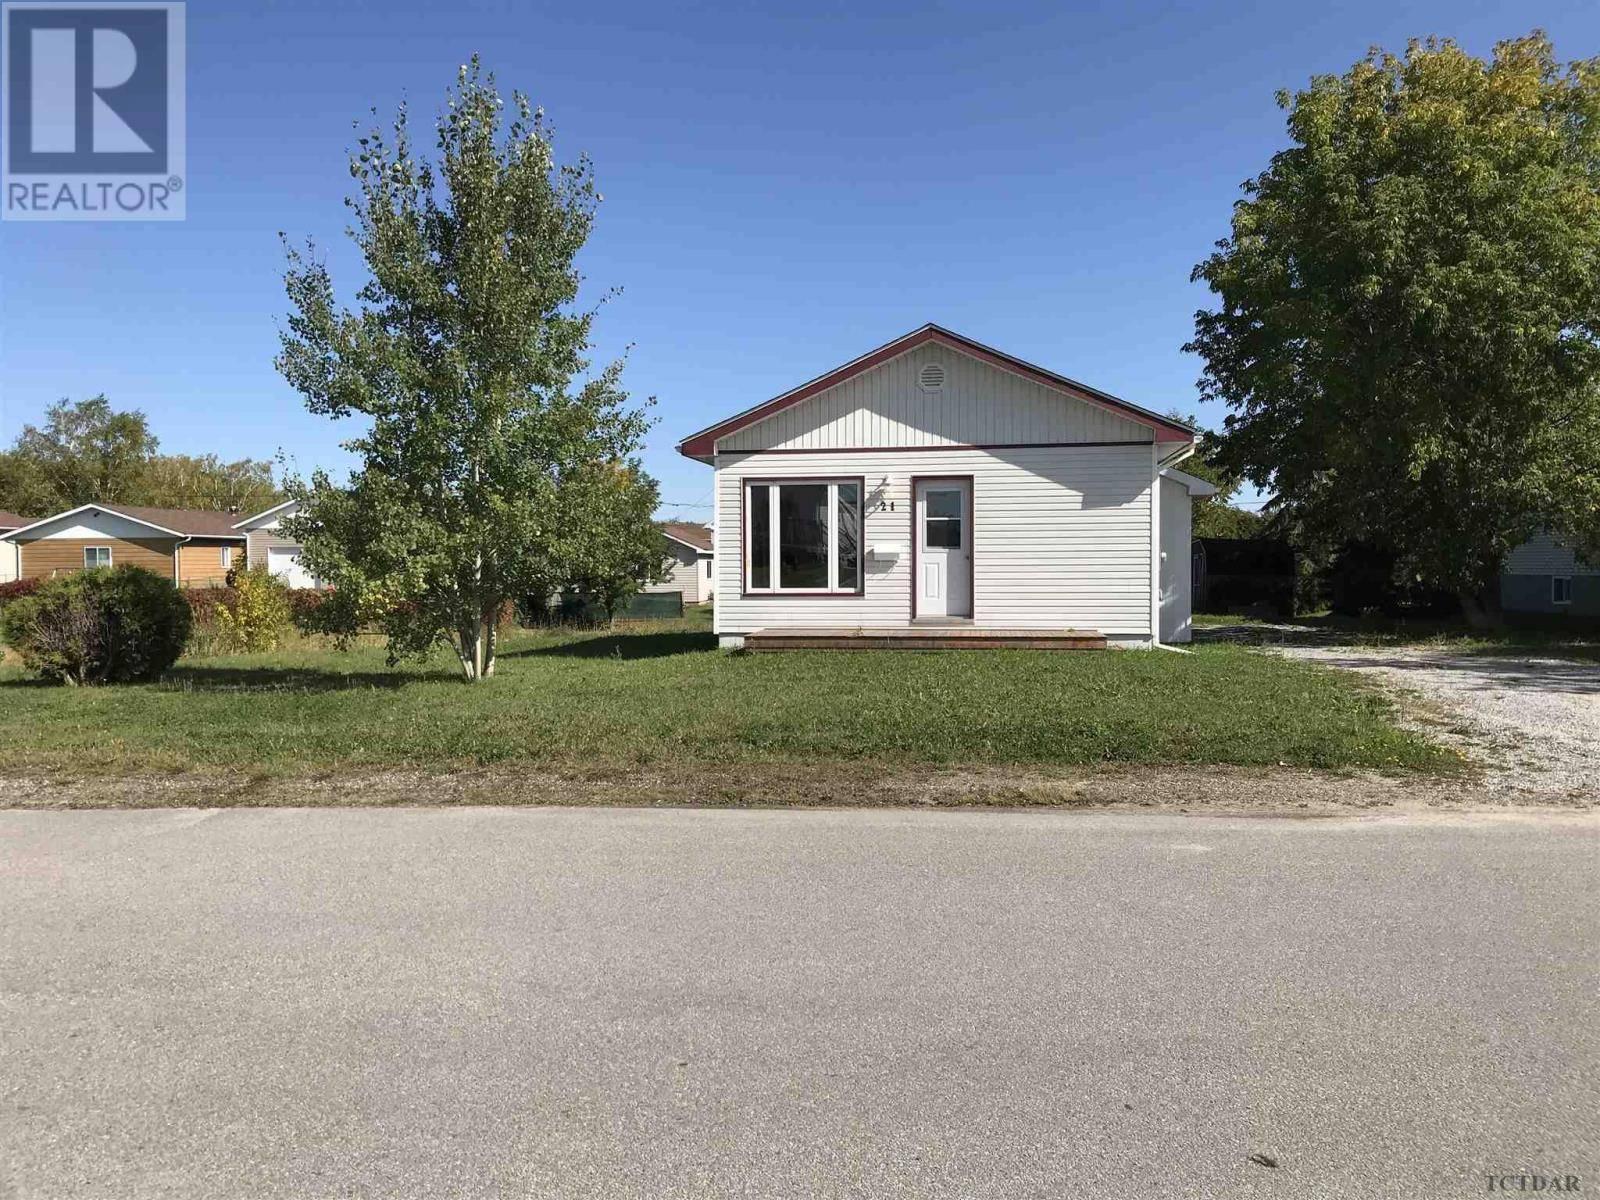 House for sale at 21 Frontenac Cres Kapuskasing Ontario - MLS: TM192258